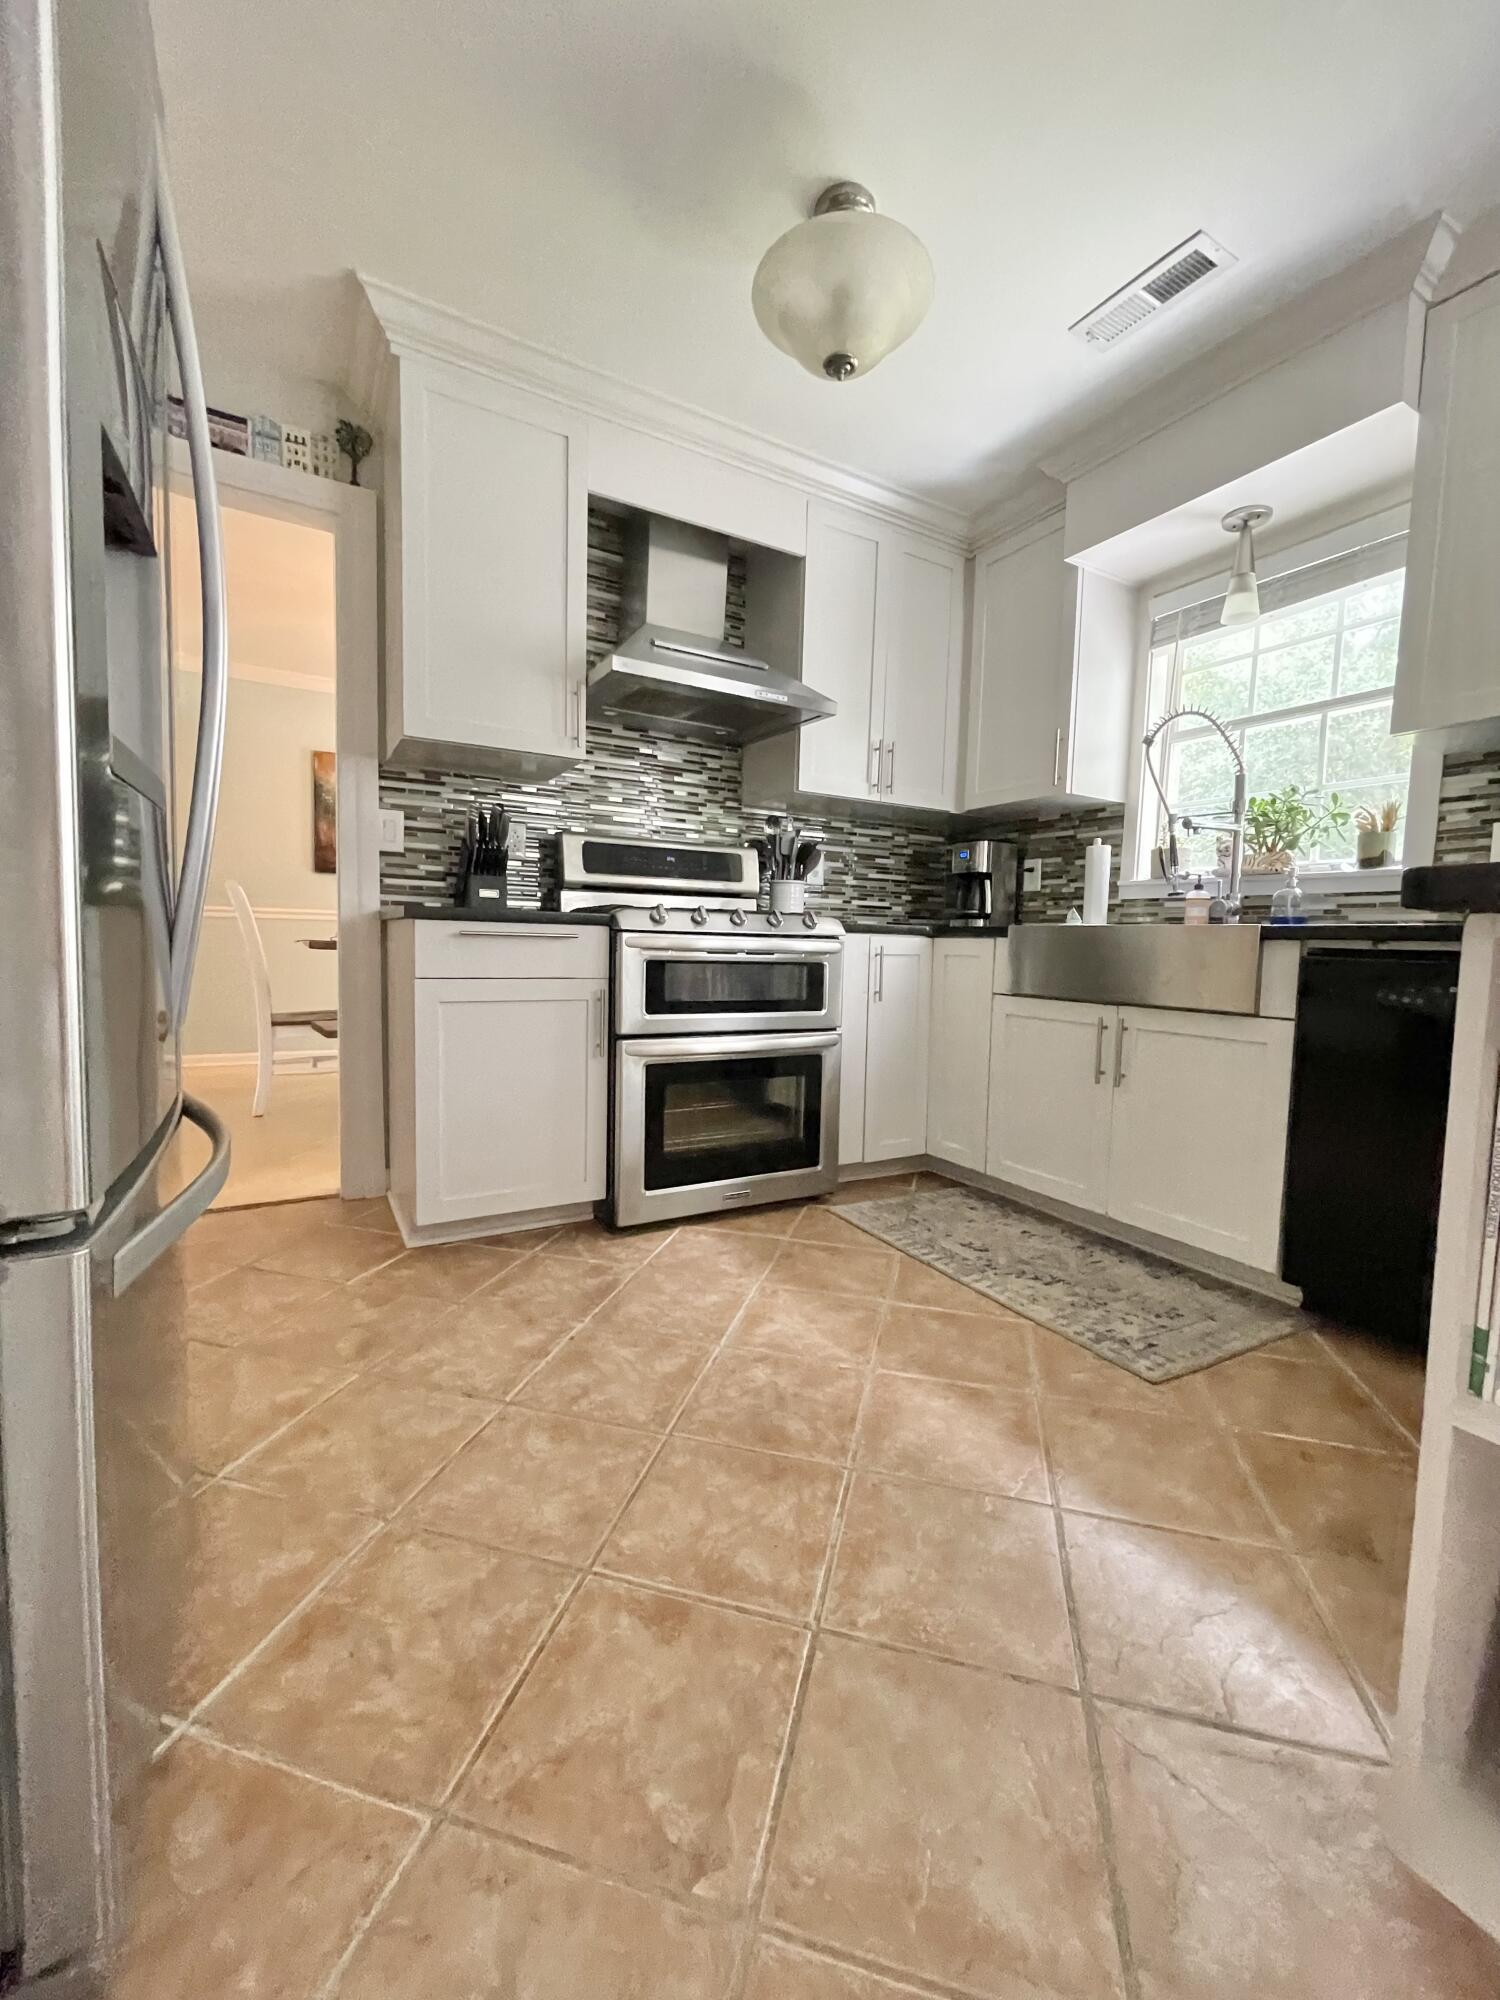 Quail Hollow Homes For Sale - 1364 Downsberry, Mount Pleasant, SC - 8